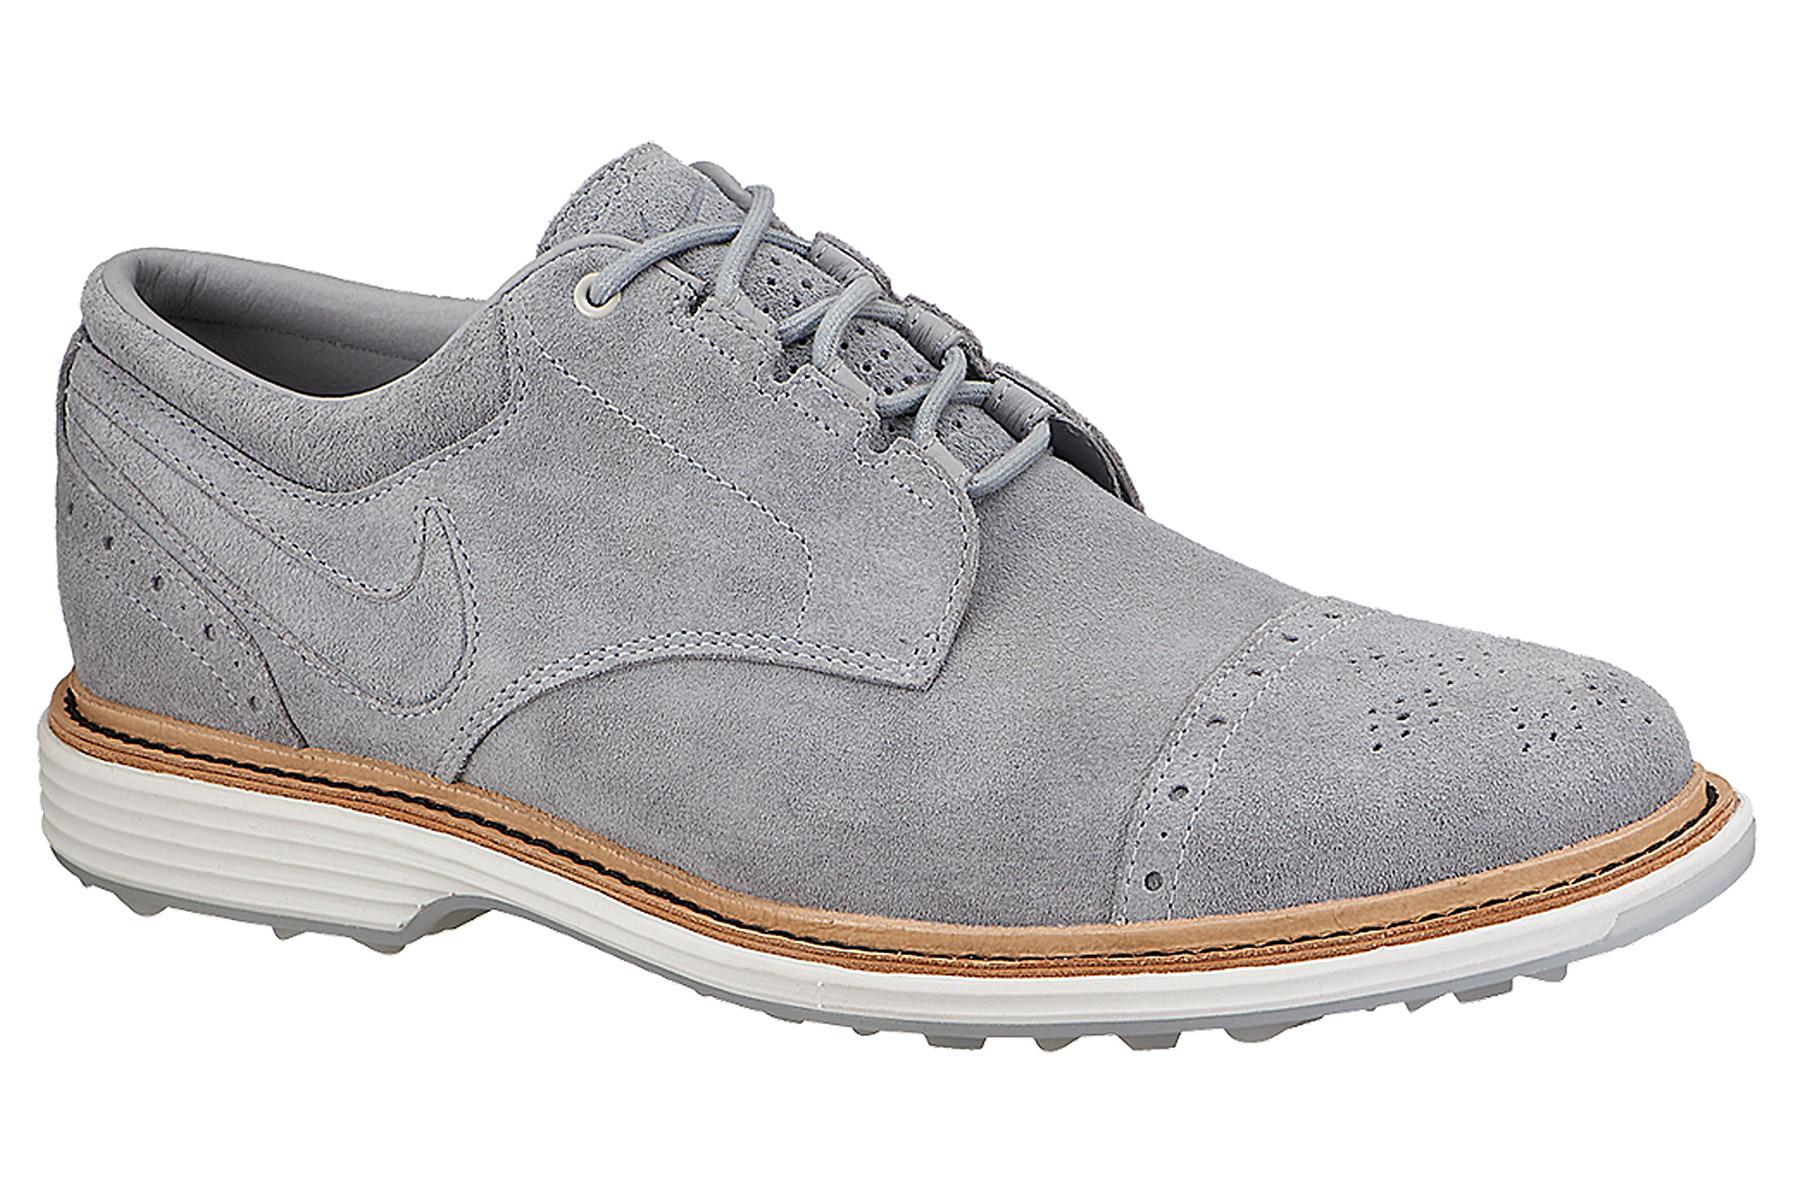 Nike Golf Shoes Clearance